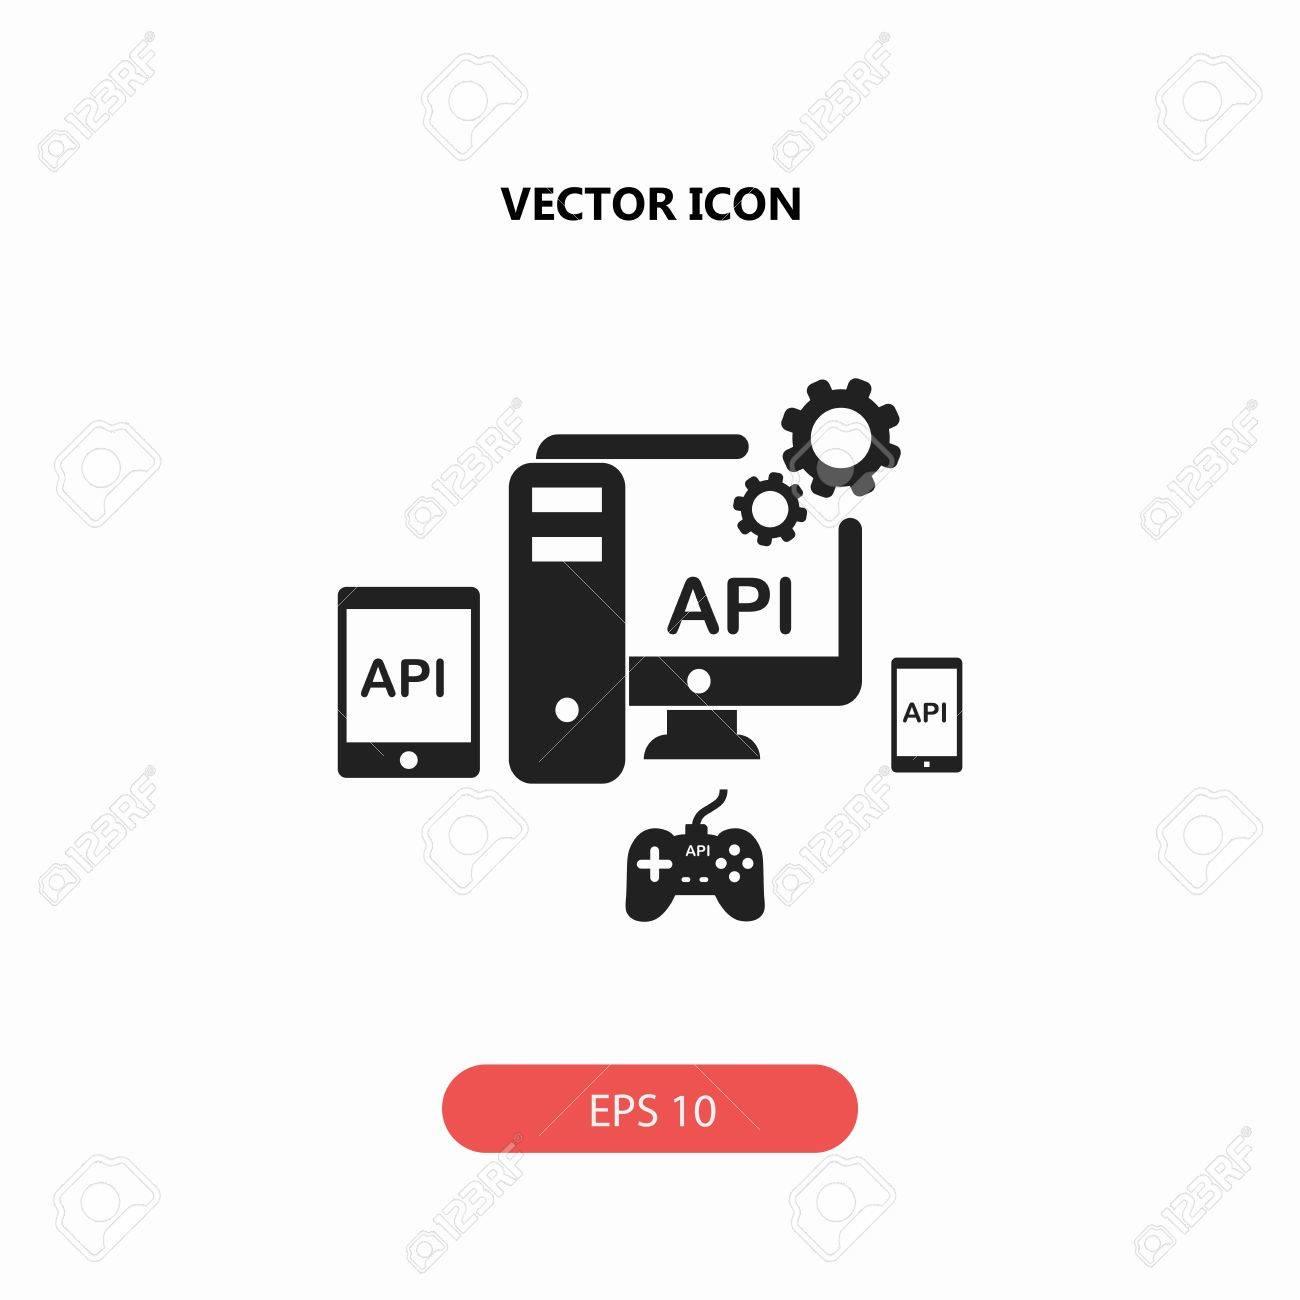 api application programming interface vector icon royalty free